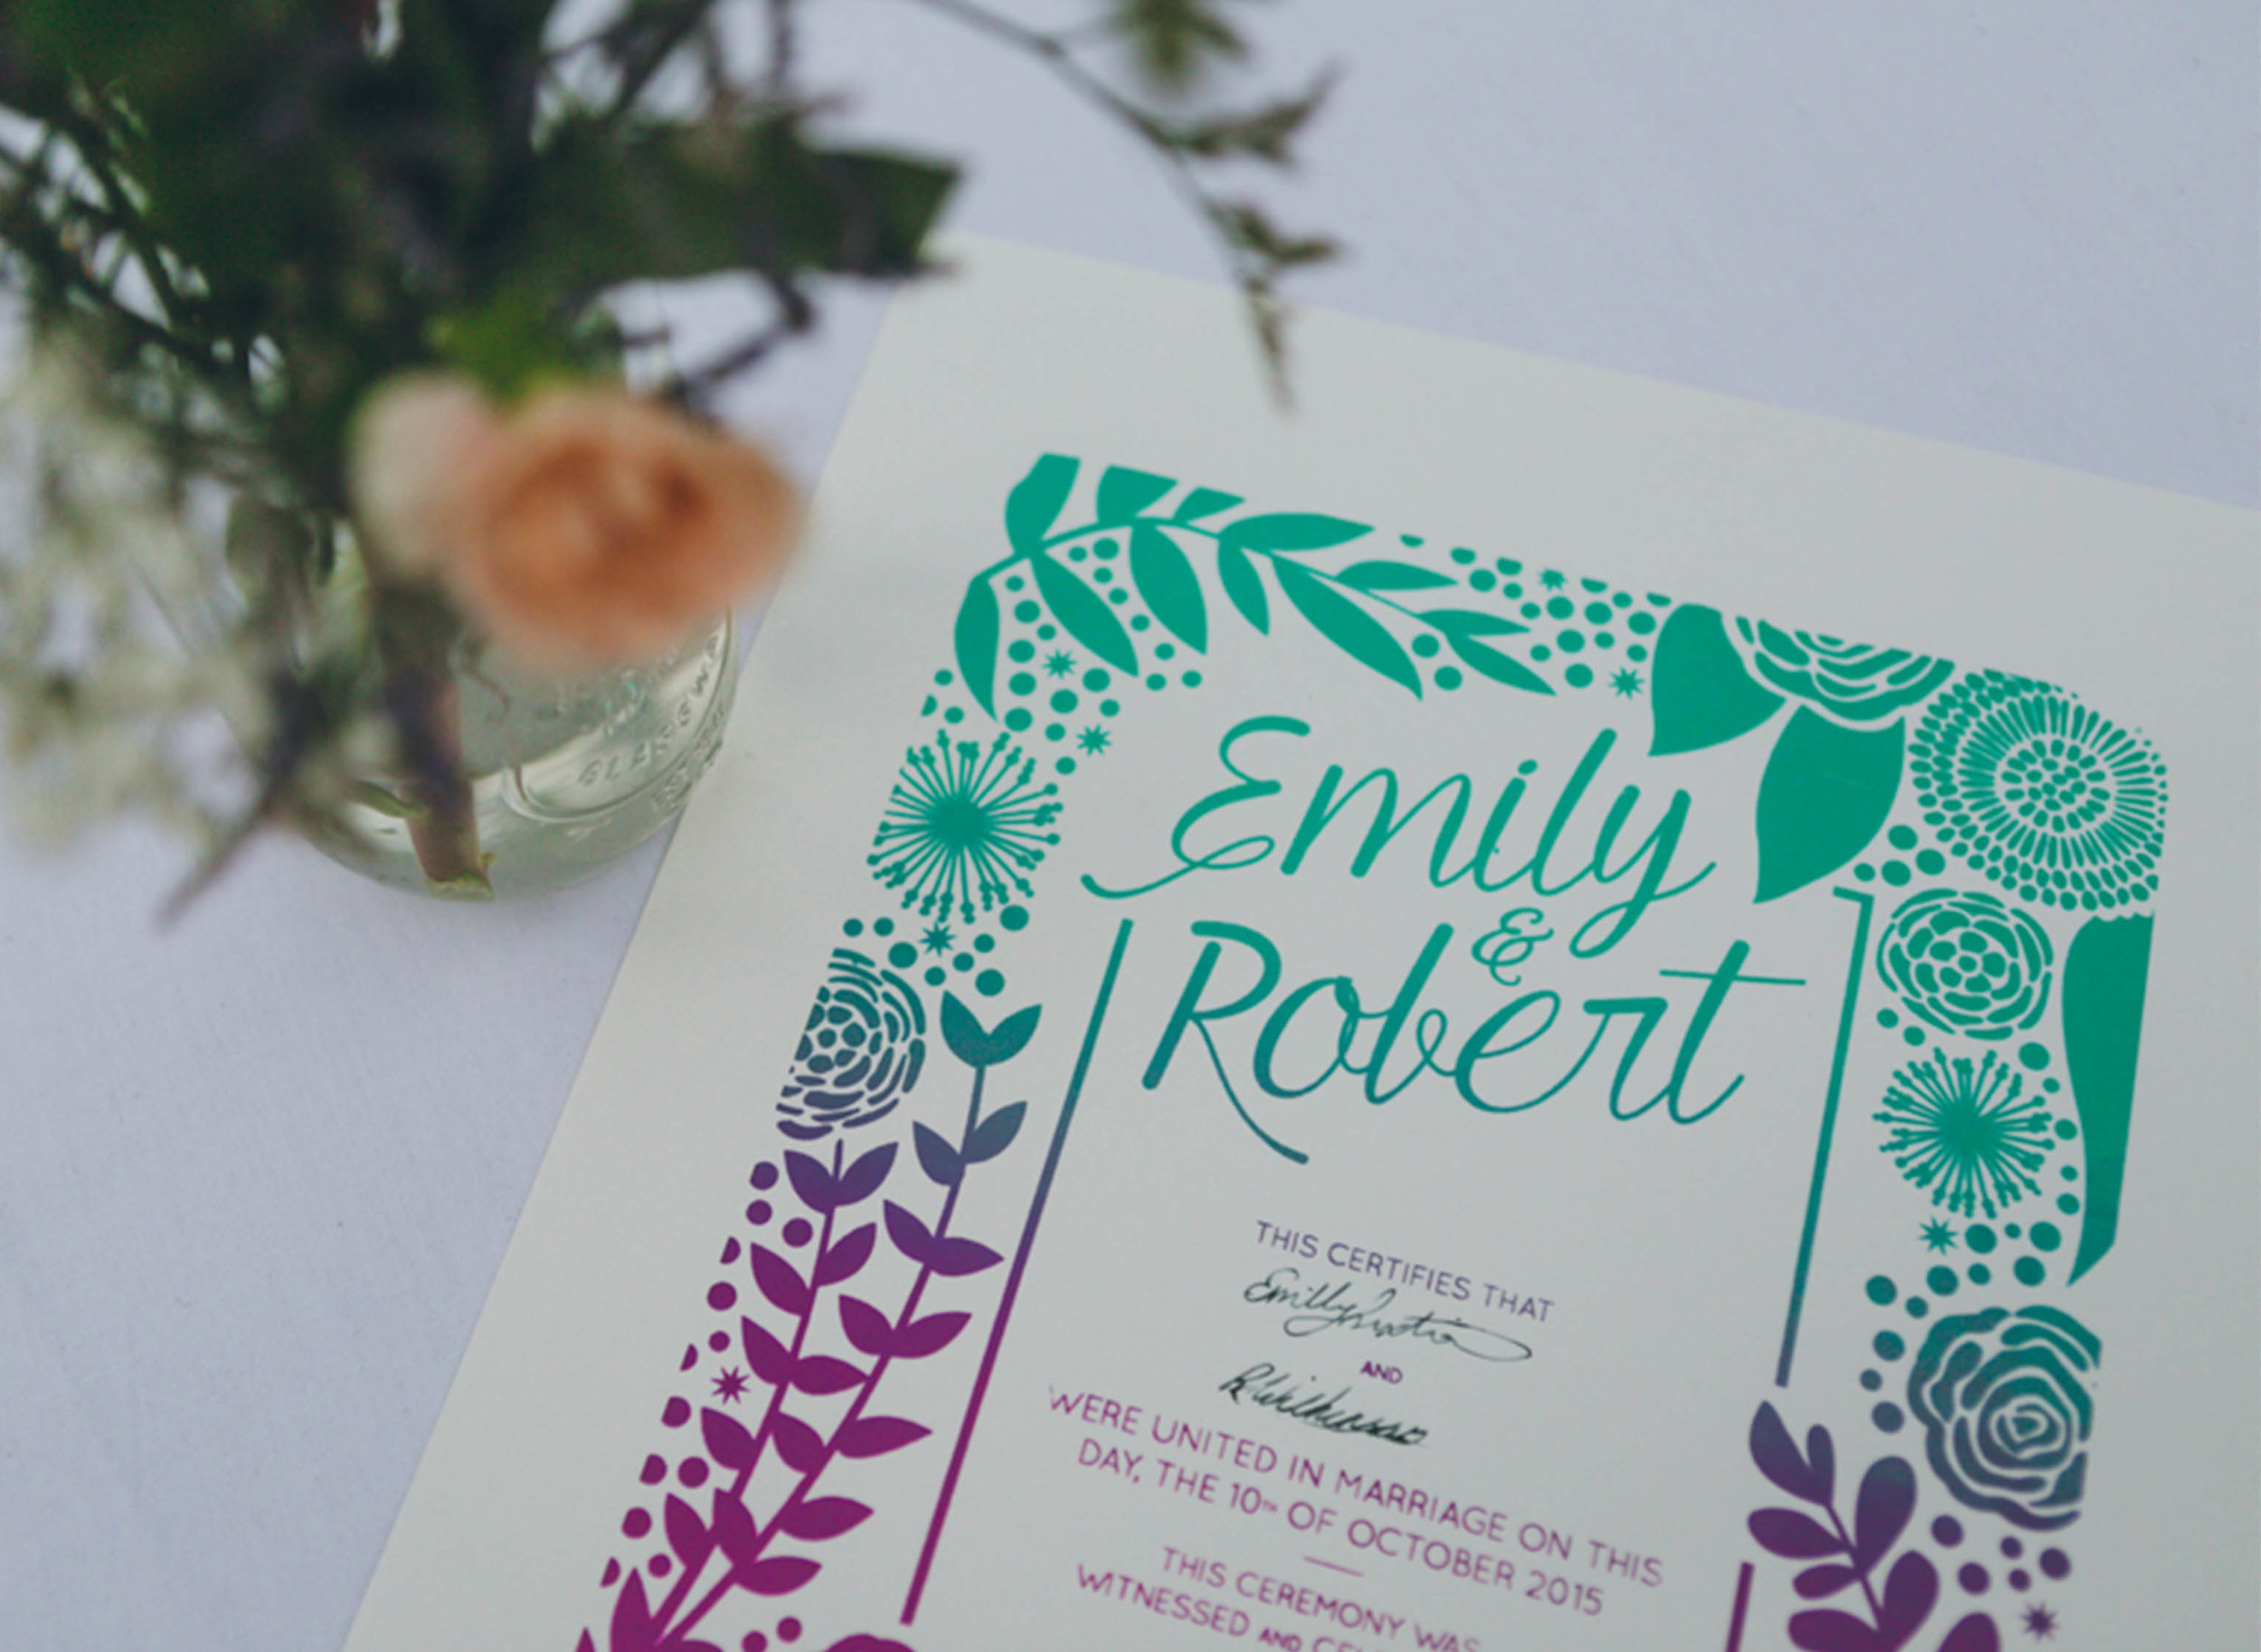 emily-wilkinson-wedding-certificate-design-screenprint-shannon-Cant.jpg